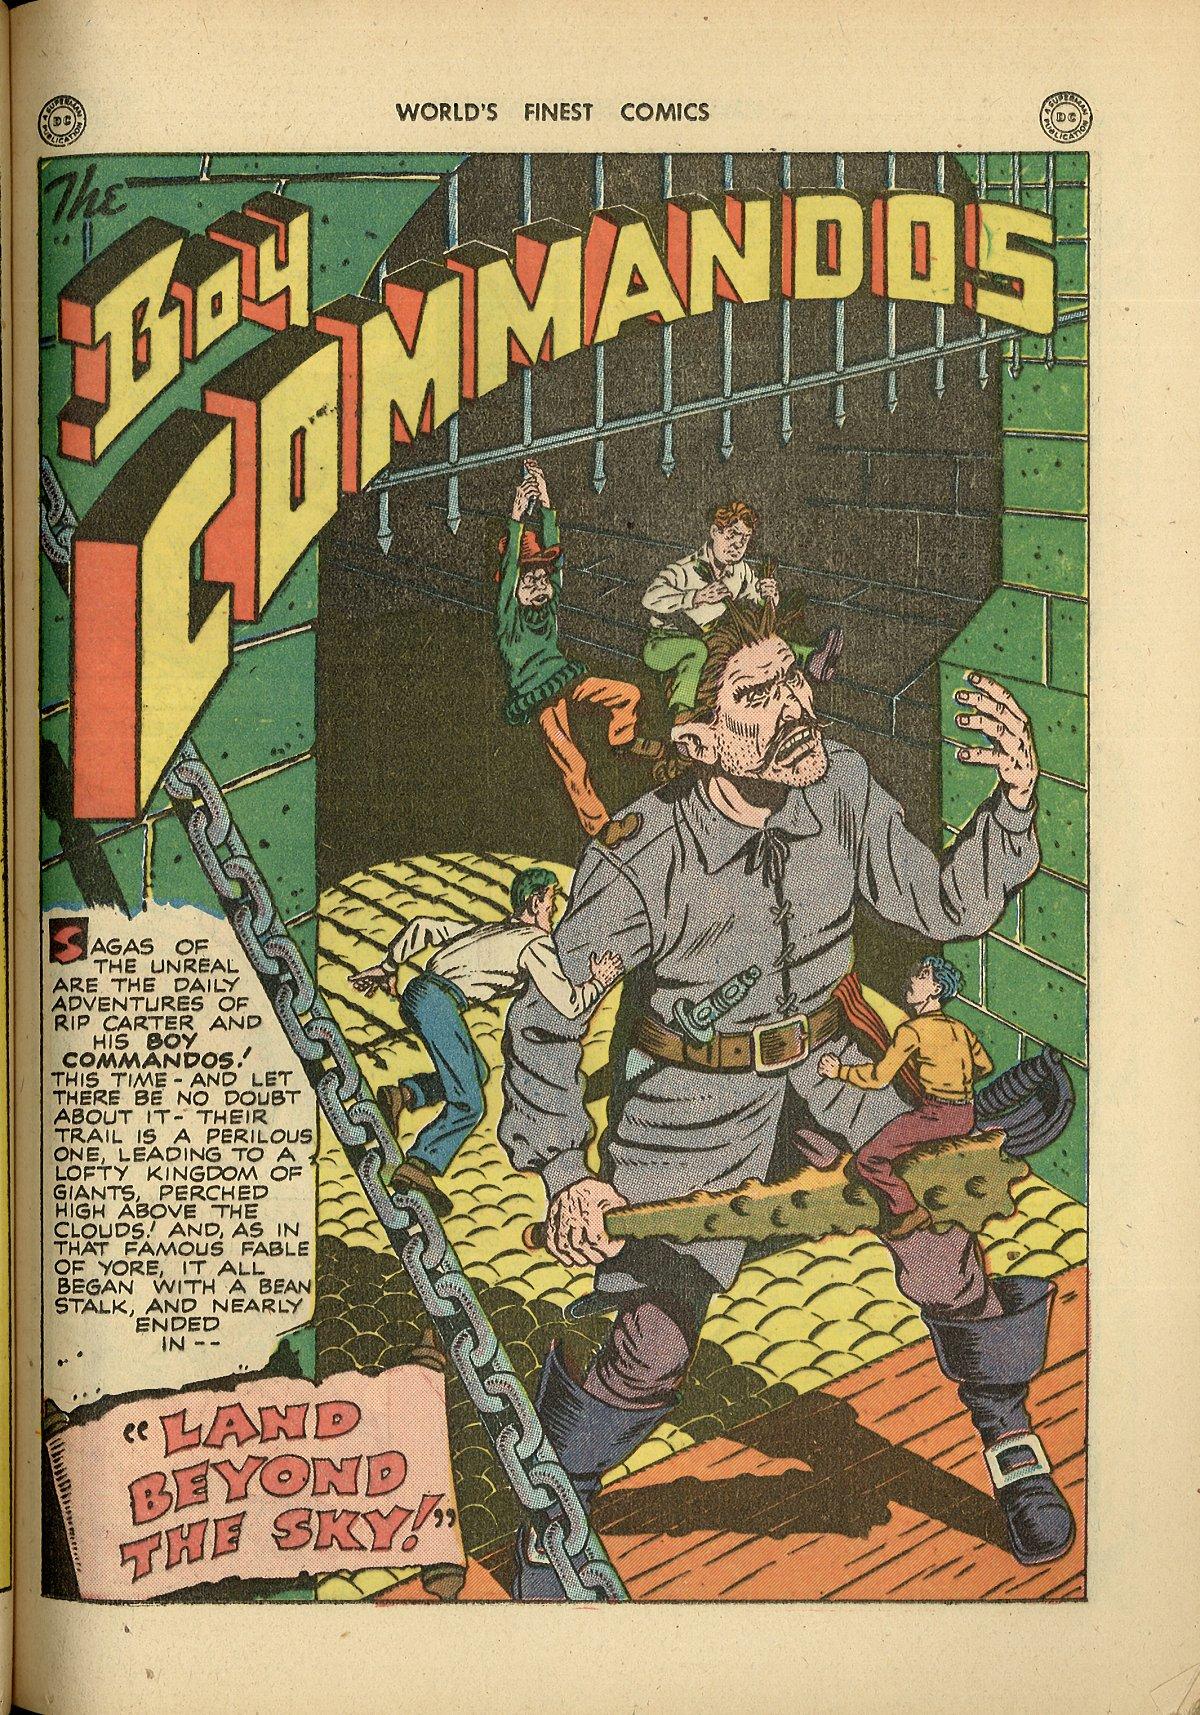 Read online World's Finest Comics comic -  Issue #26 - 25